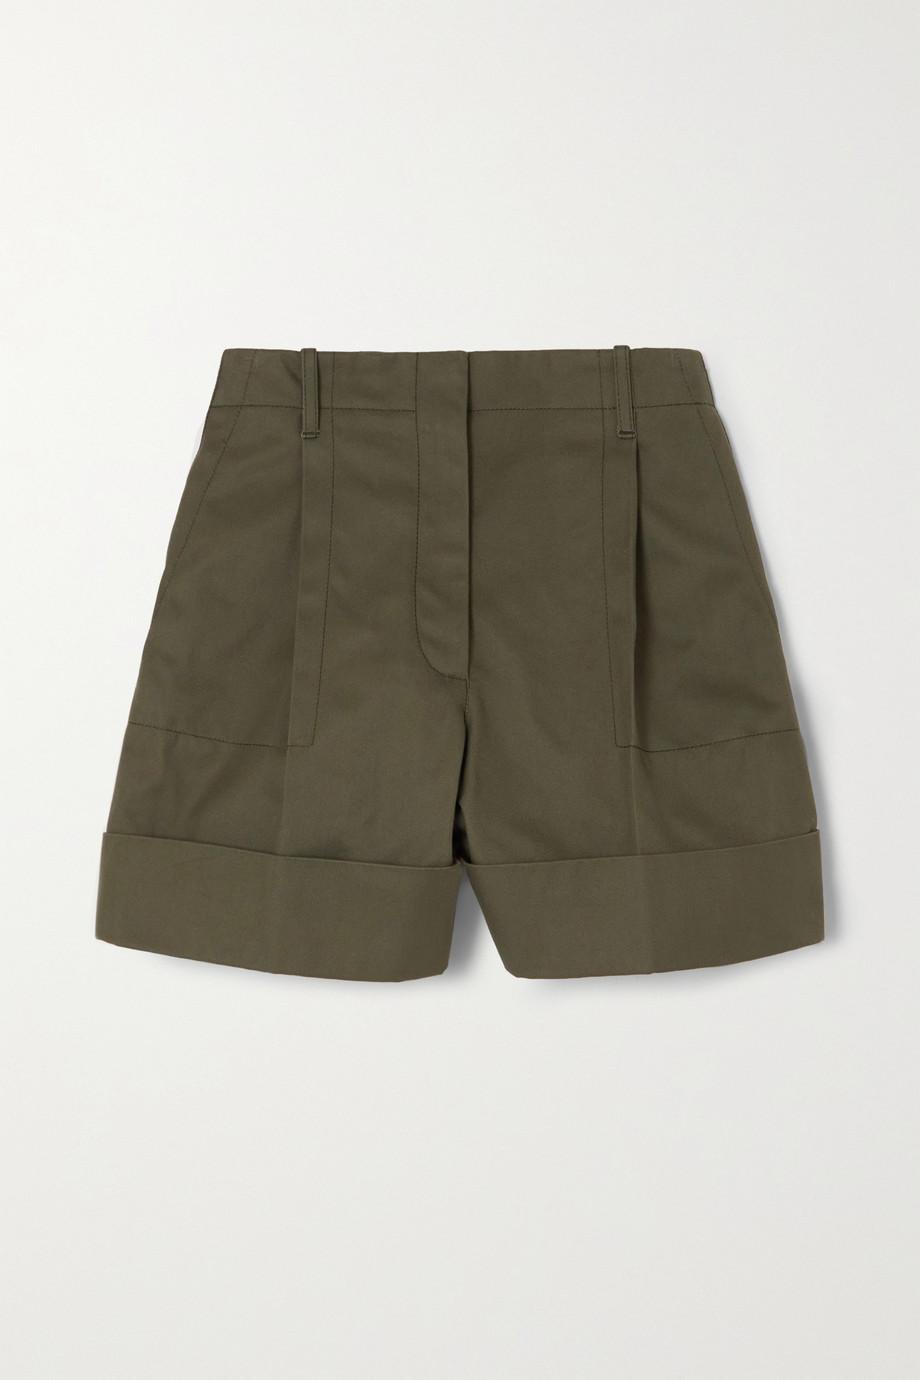 Alexander McQueen Pleated cotton-drill shorts